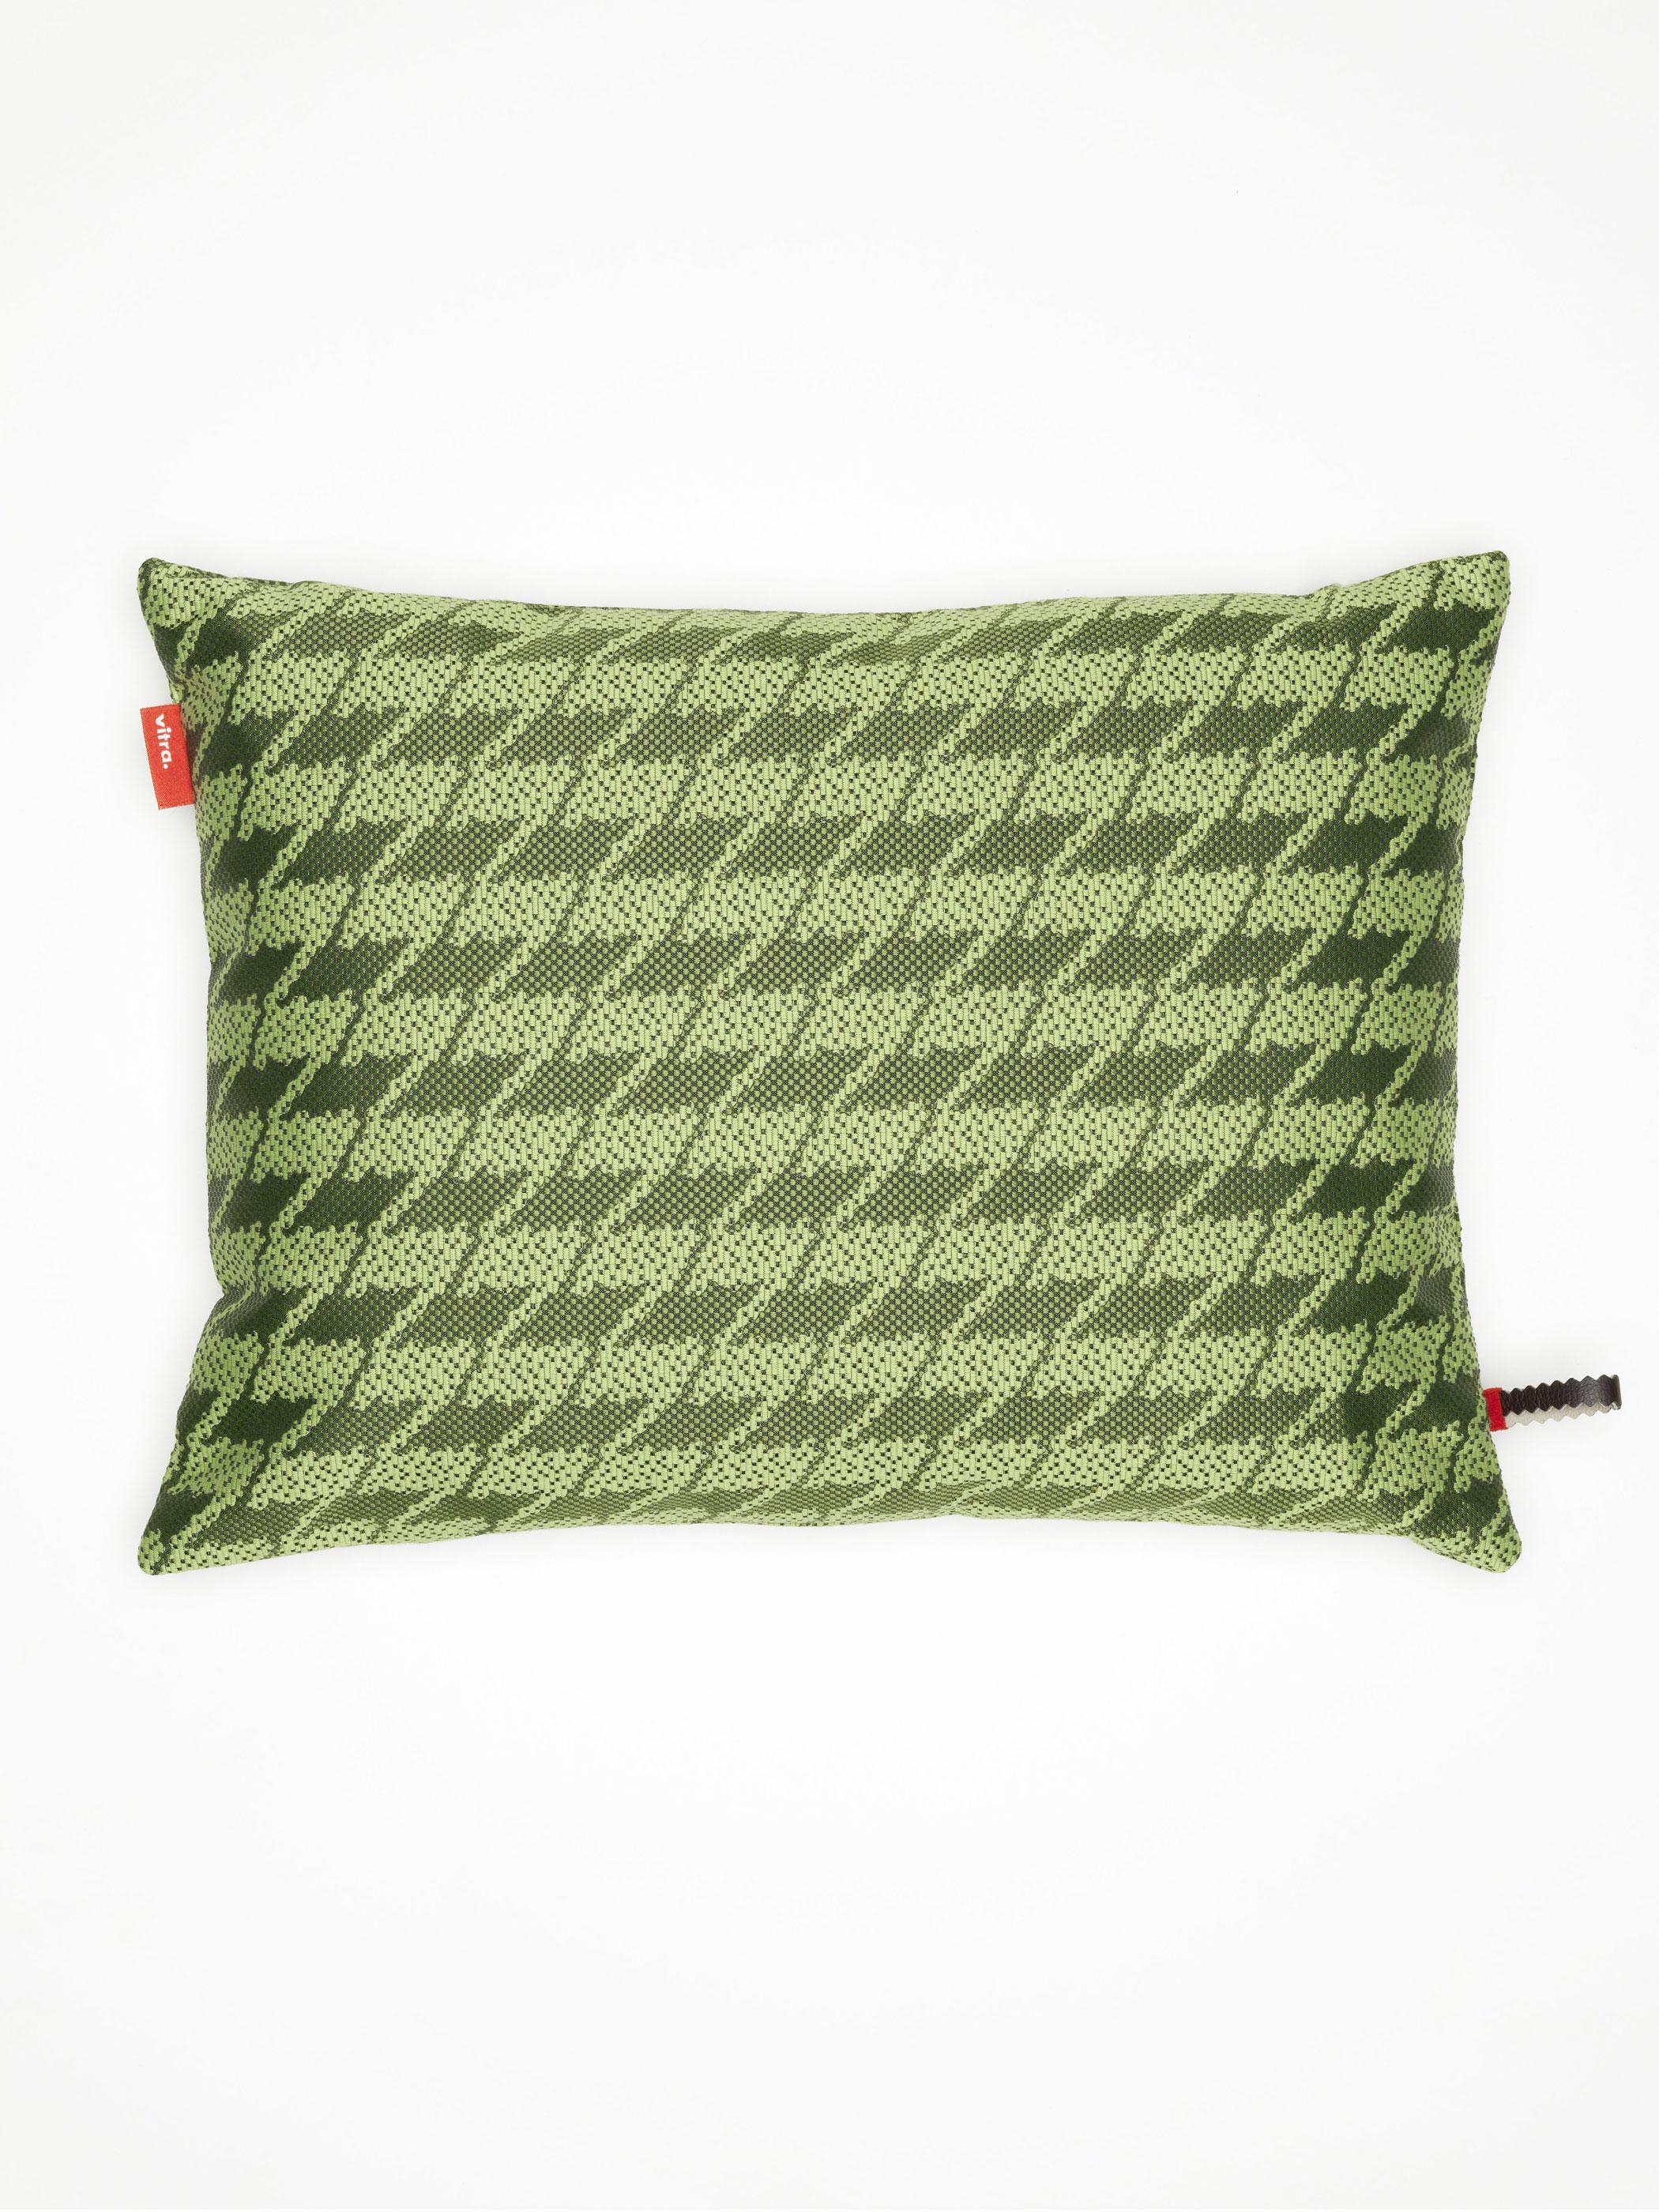 vitra kissen maharam repeat classic houndstooth moss produktdetails. Black Bedroom Furniture Sets. Home Design Ideas